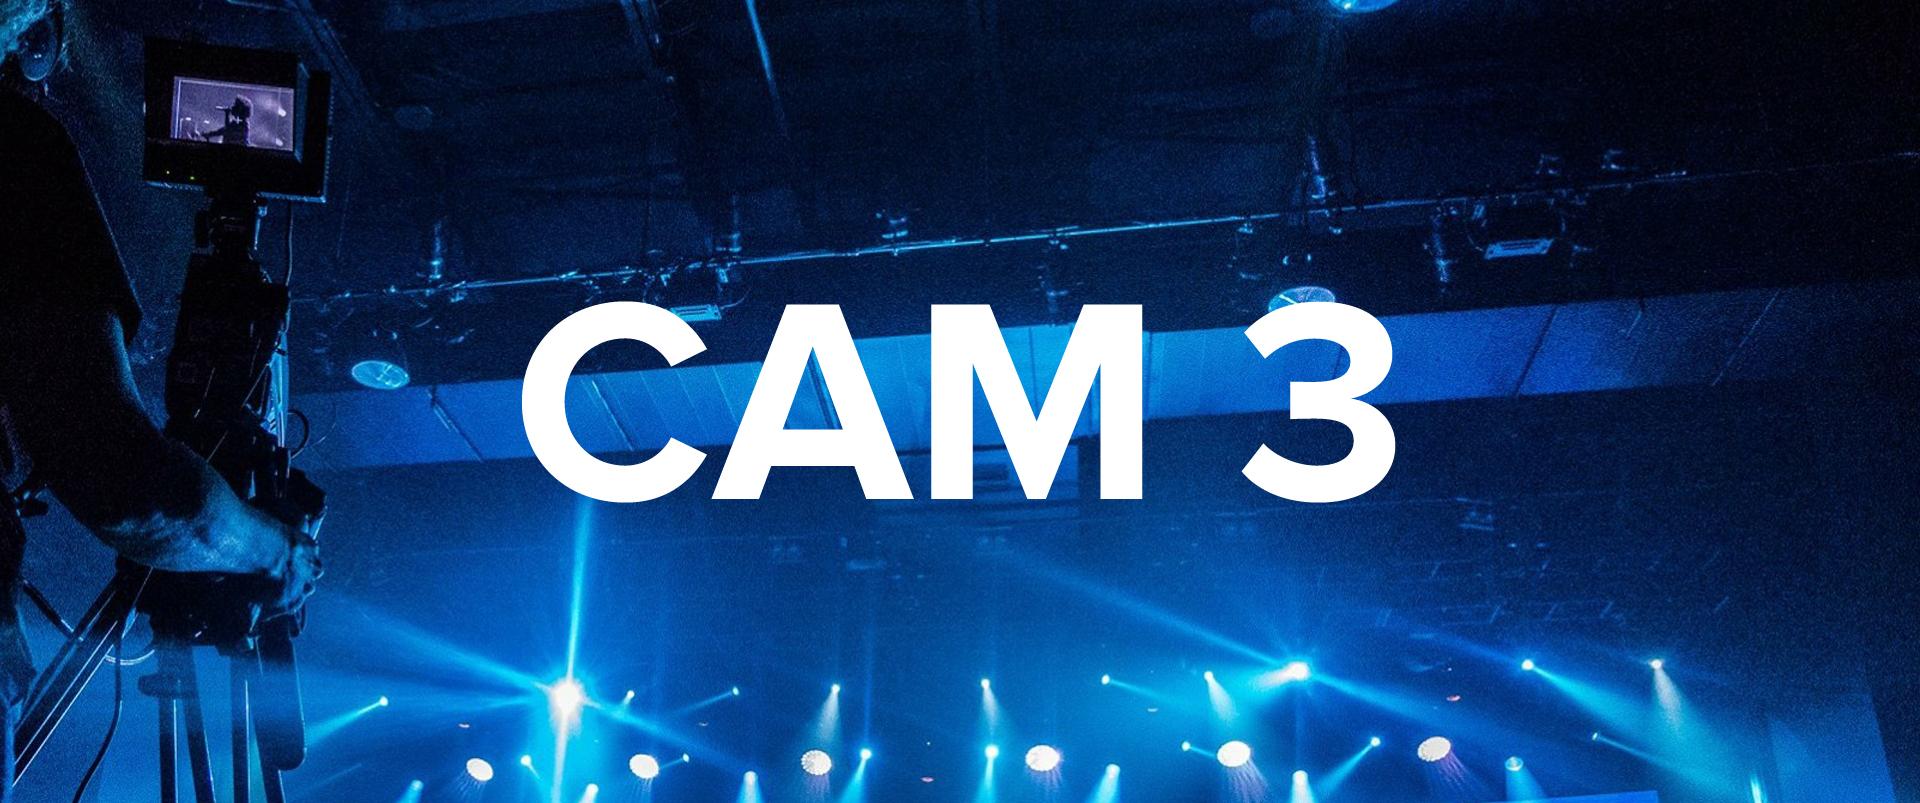 Cam 3.jpg